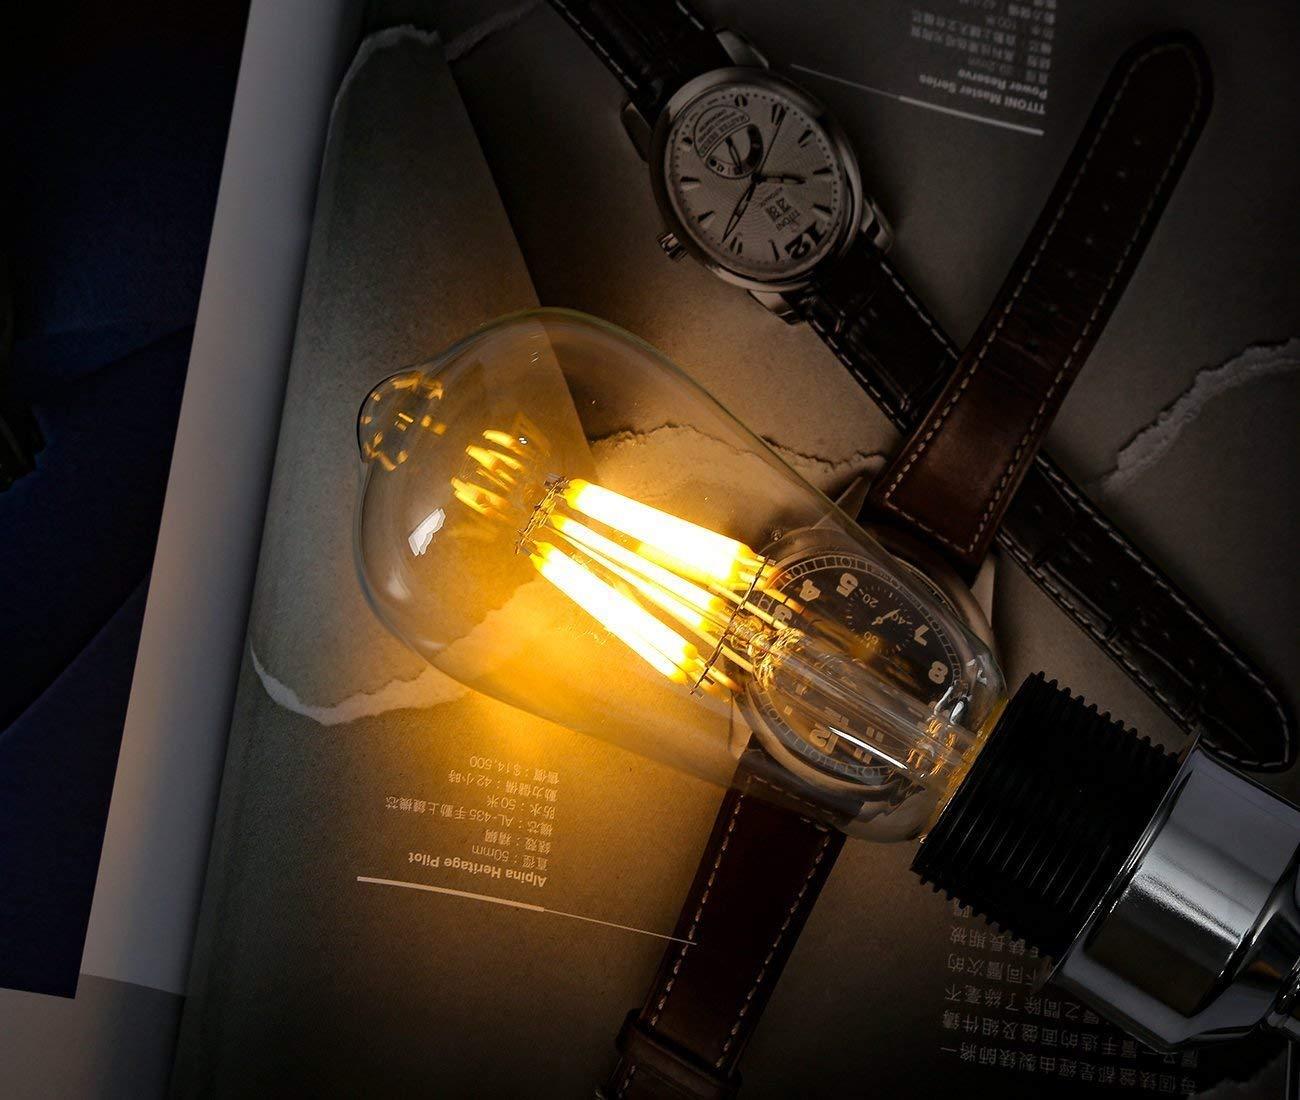 LED Bombilla de Edison Vintage Lámpara 4W E27 ST64 2700K Luz Blanca Cálida No regulable, Luxbird Retro Bombillas Decorativas para Jardín, salón, ...